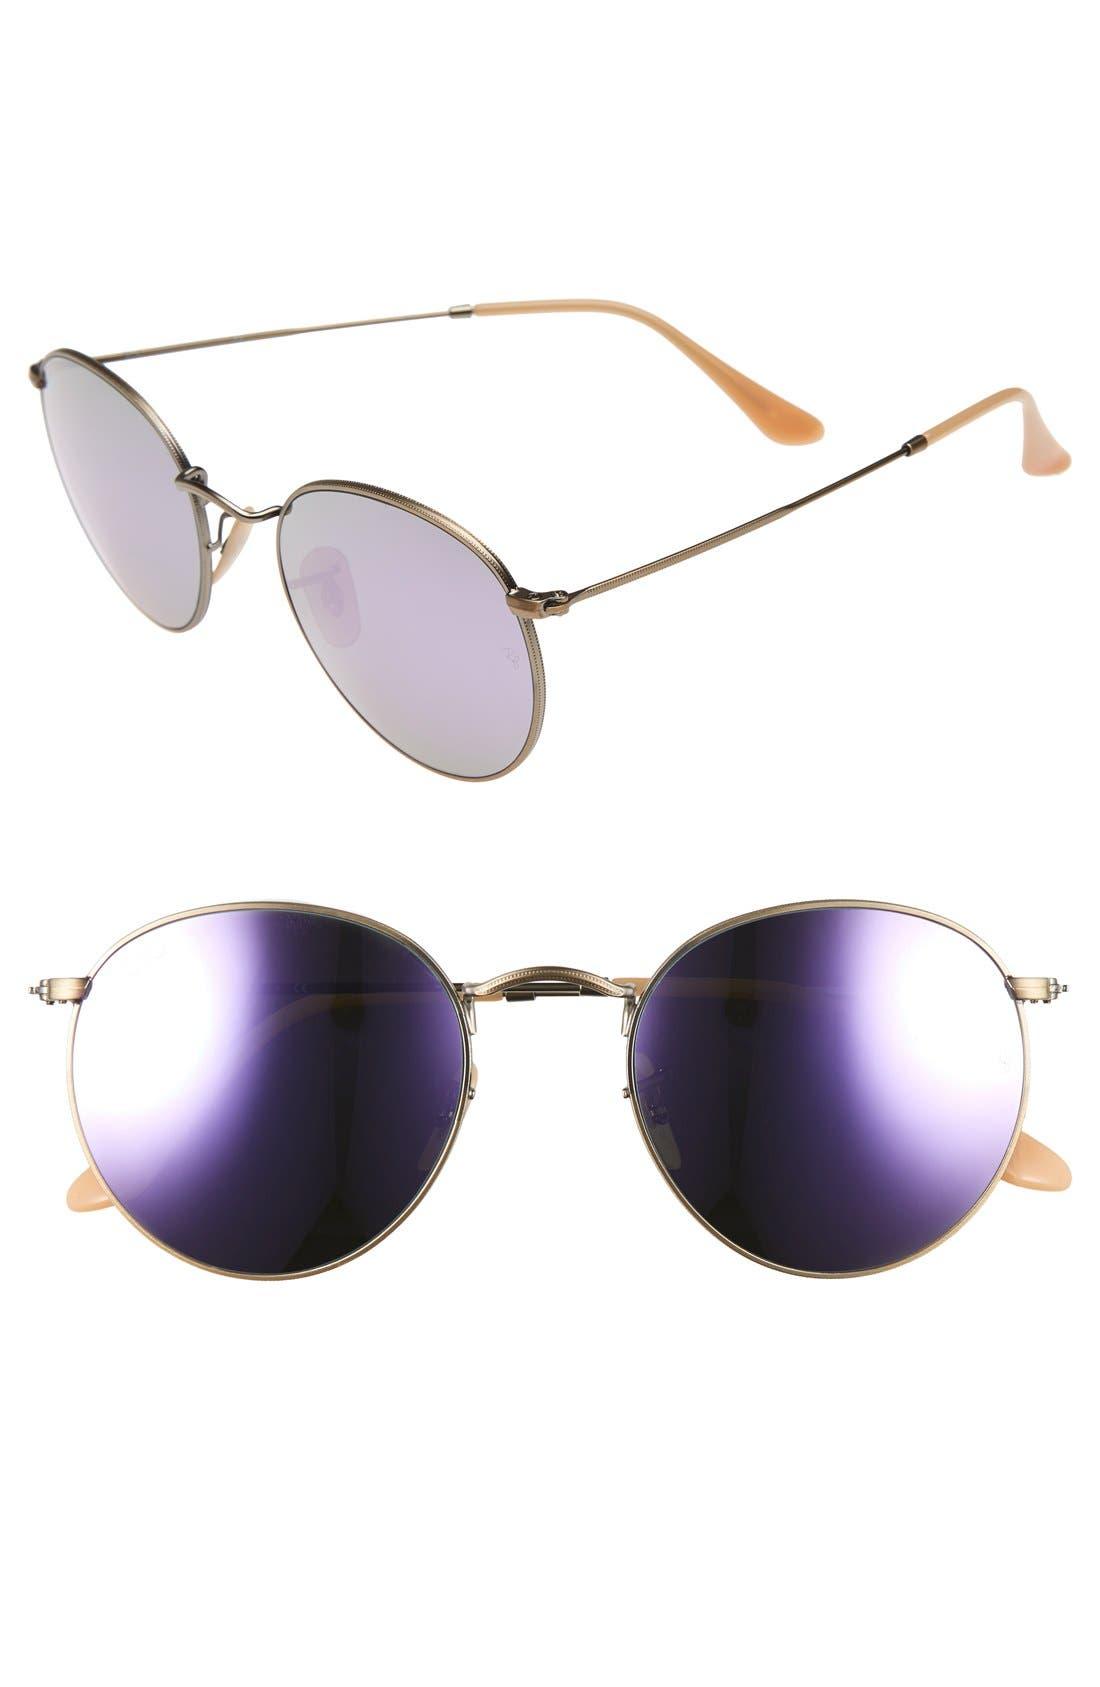 Main Image - Ray-Ban Icons 53mm Retro Sunglasses